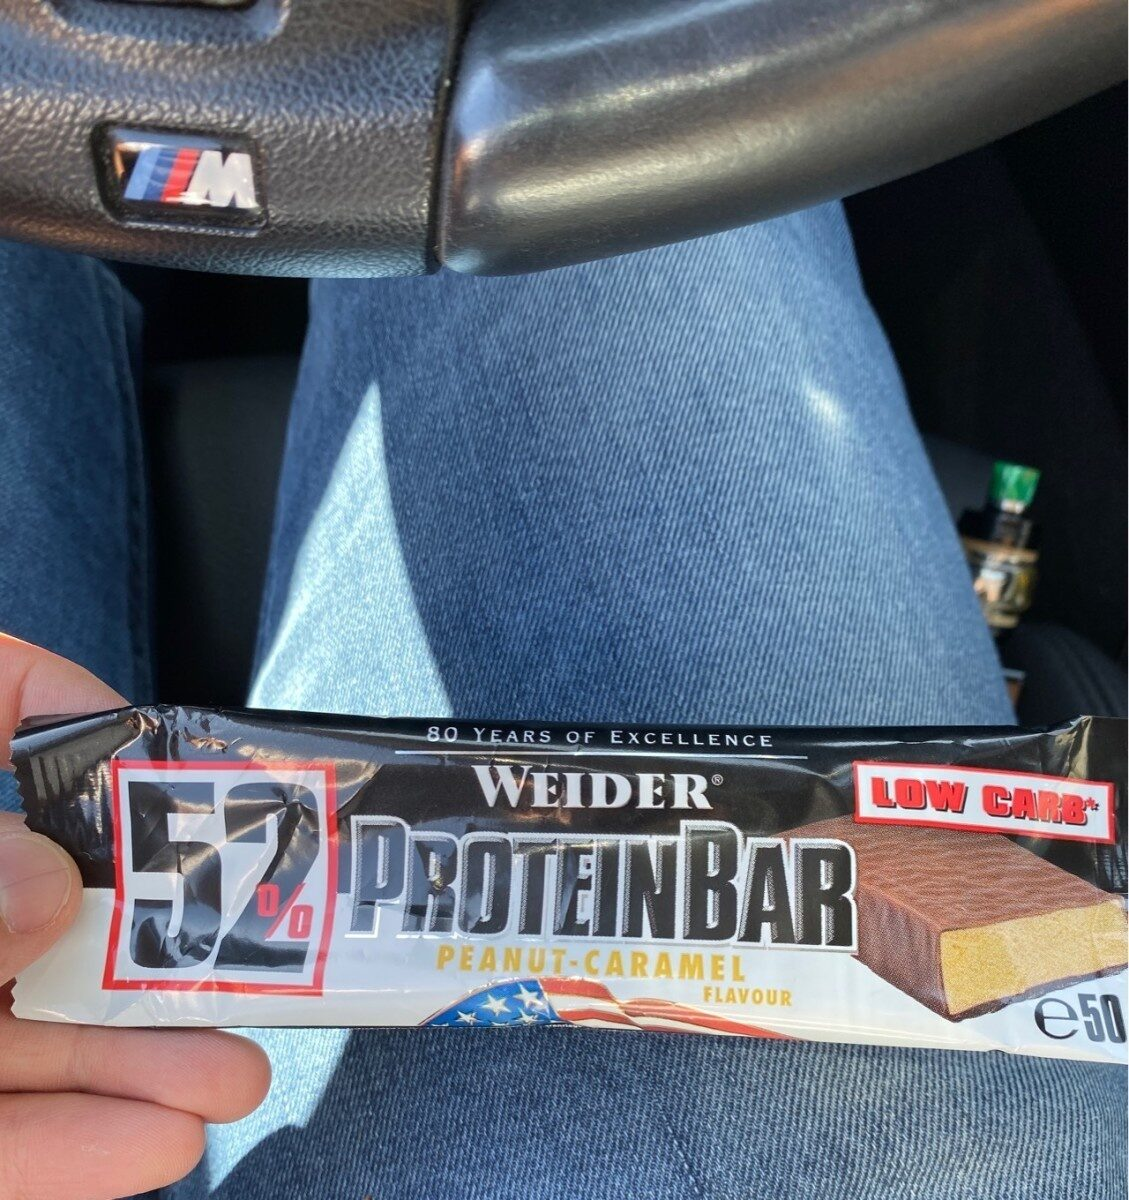 Proteinbar 52%, Peanut Caramel - Product - es